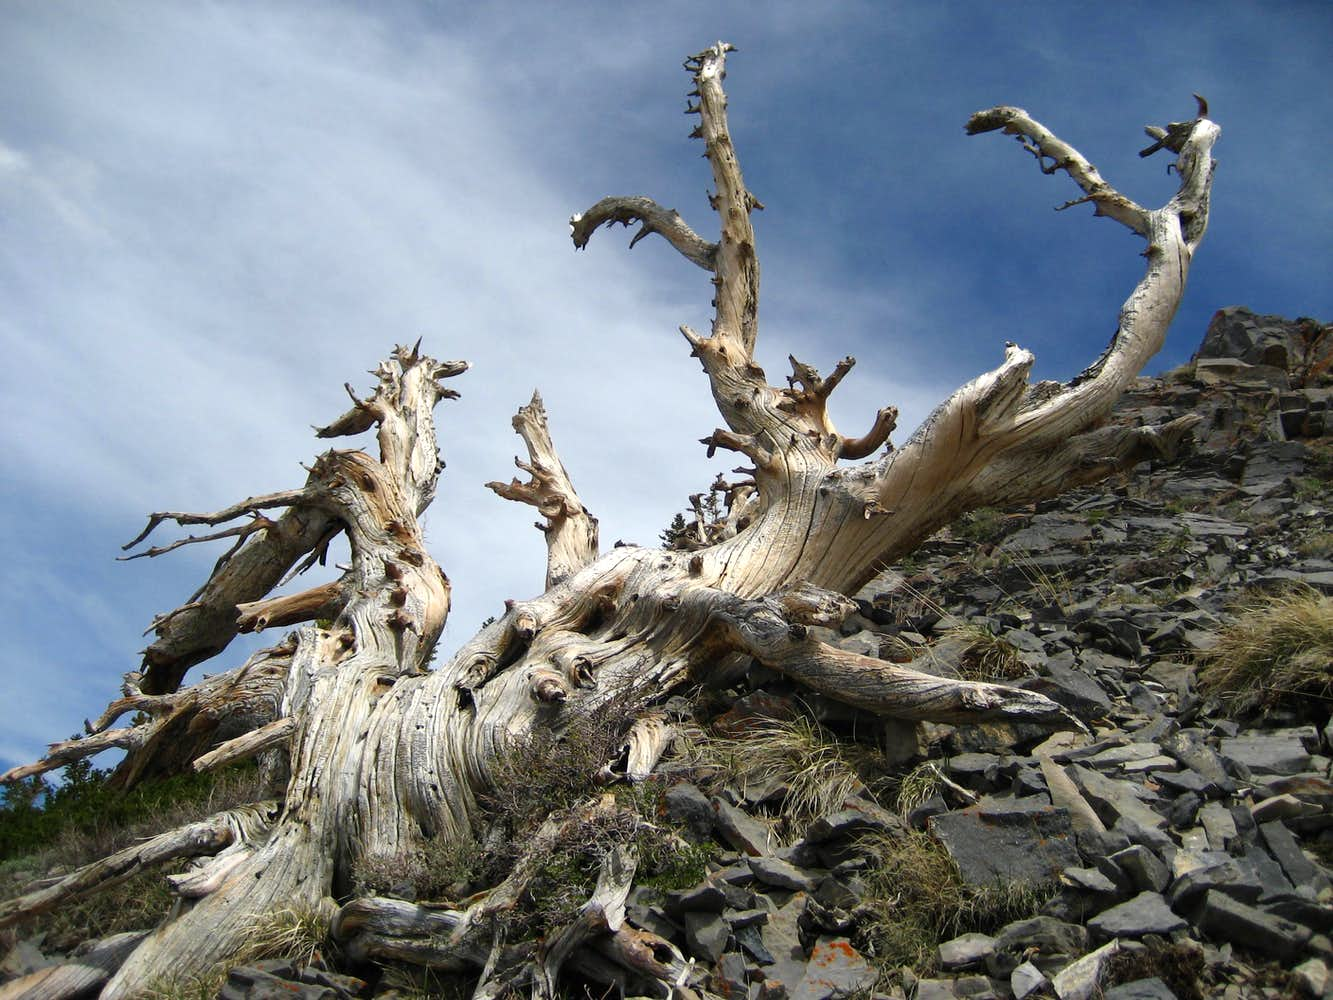 Dead tree in Death Valley by michela ravasio - Stocksy United